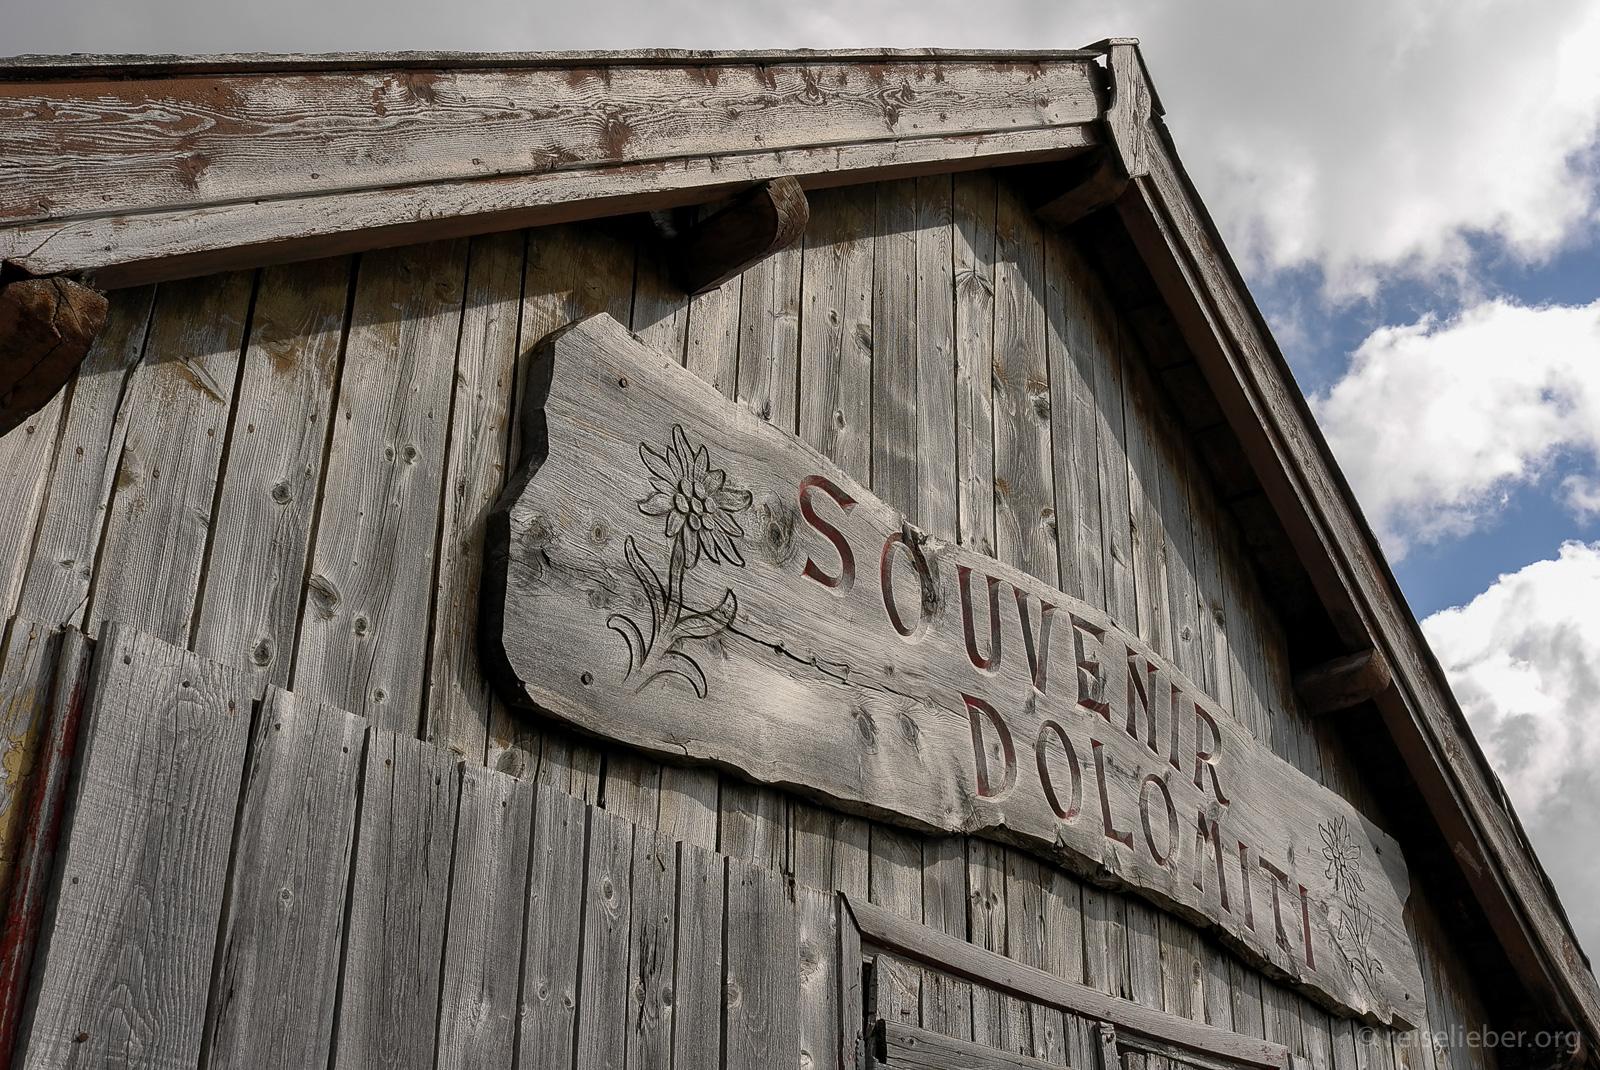 20141006_Suedtirol_Dolomiten_Huettentour1410_dolomiten_L1121298